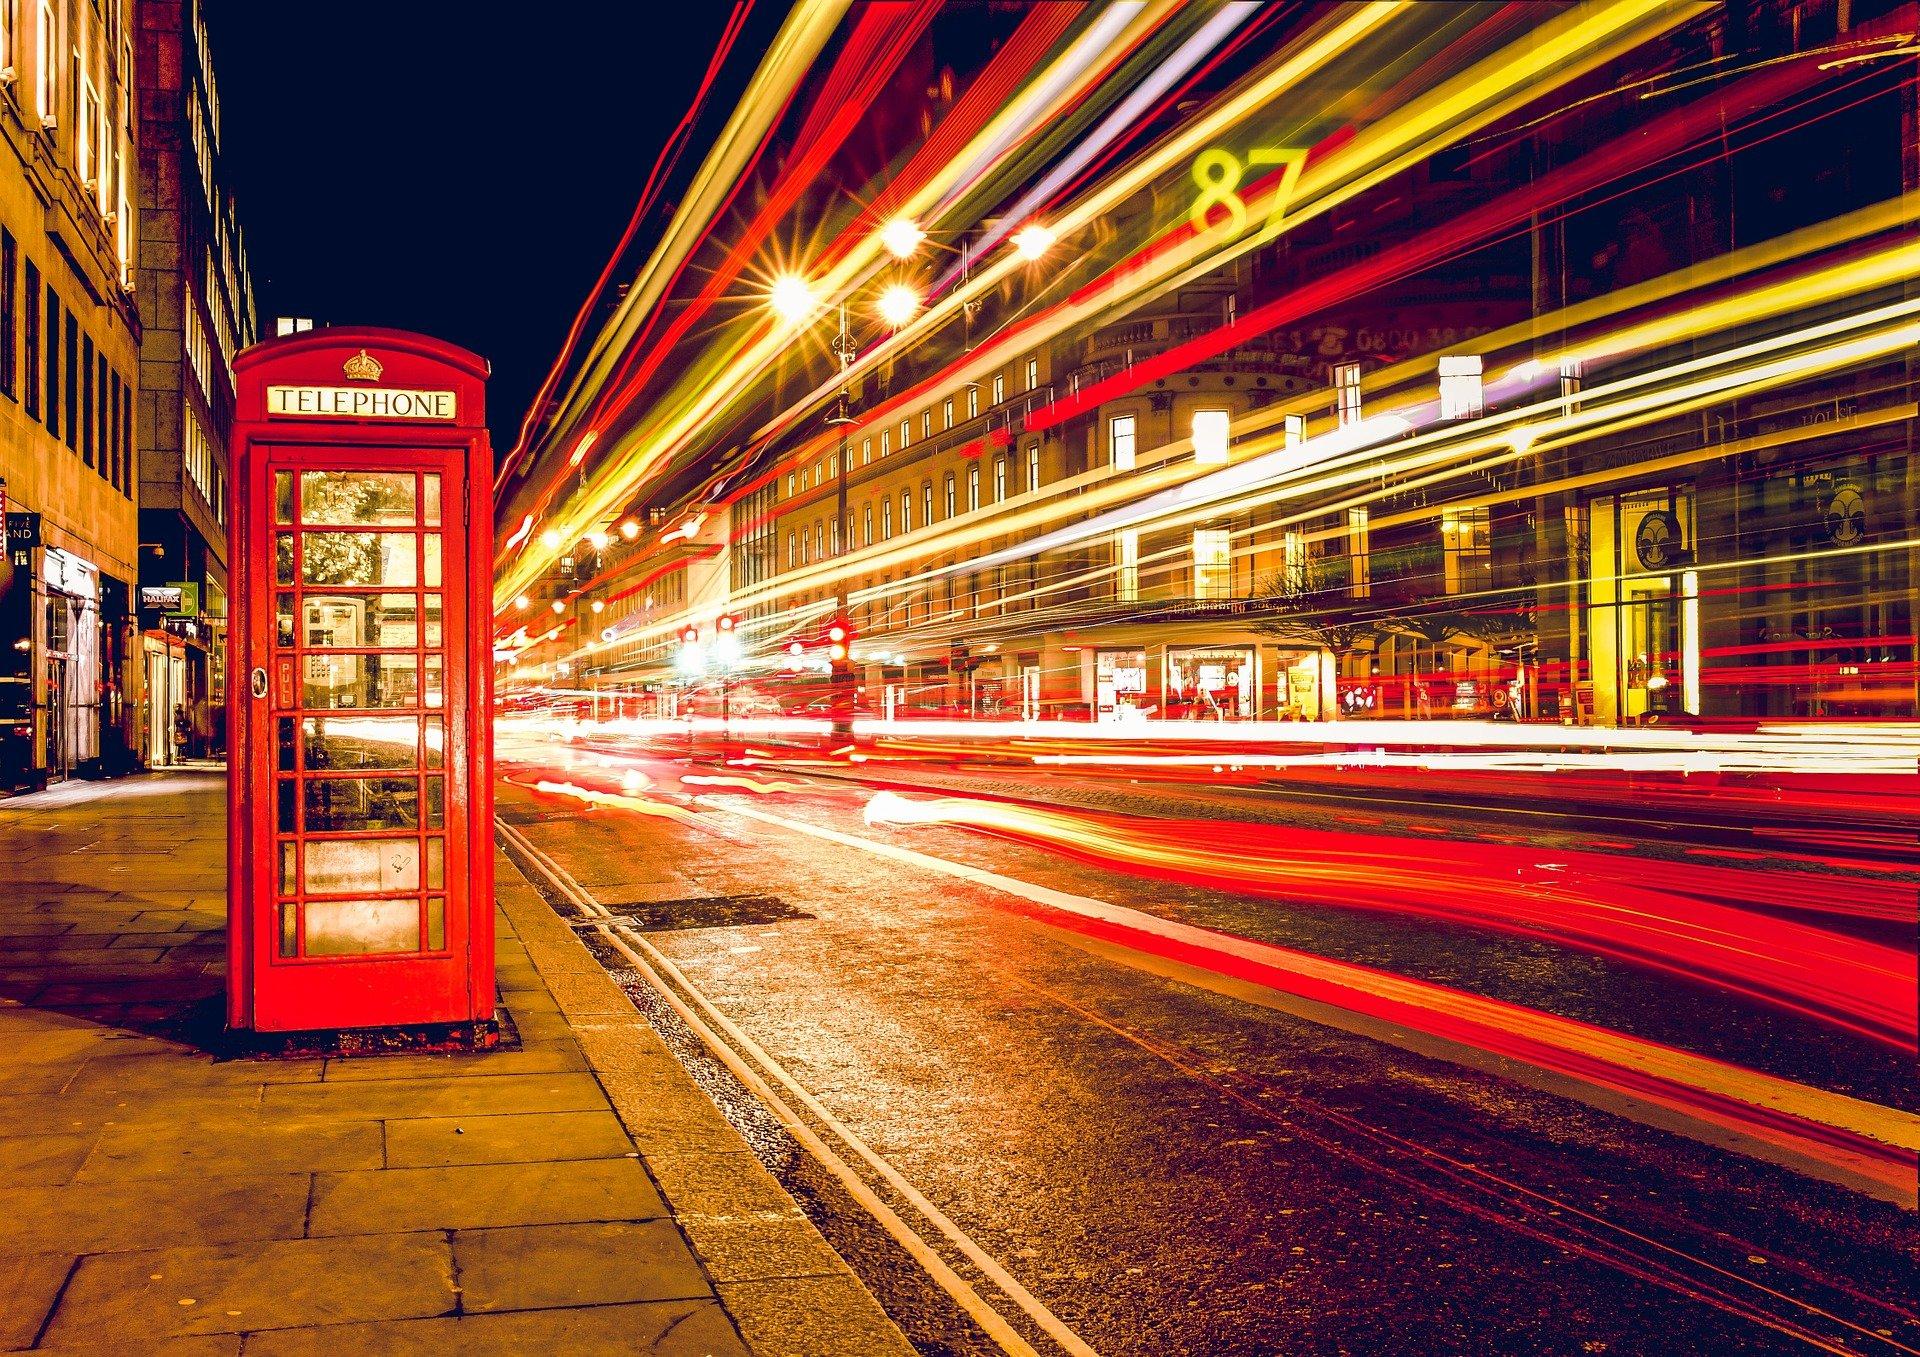 London_telephone-booth